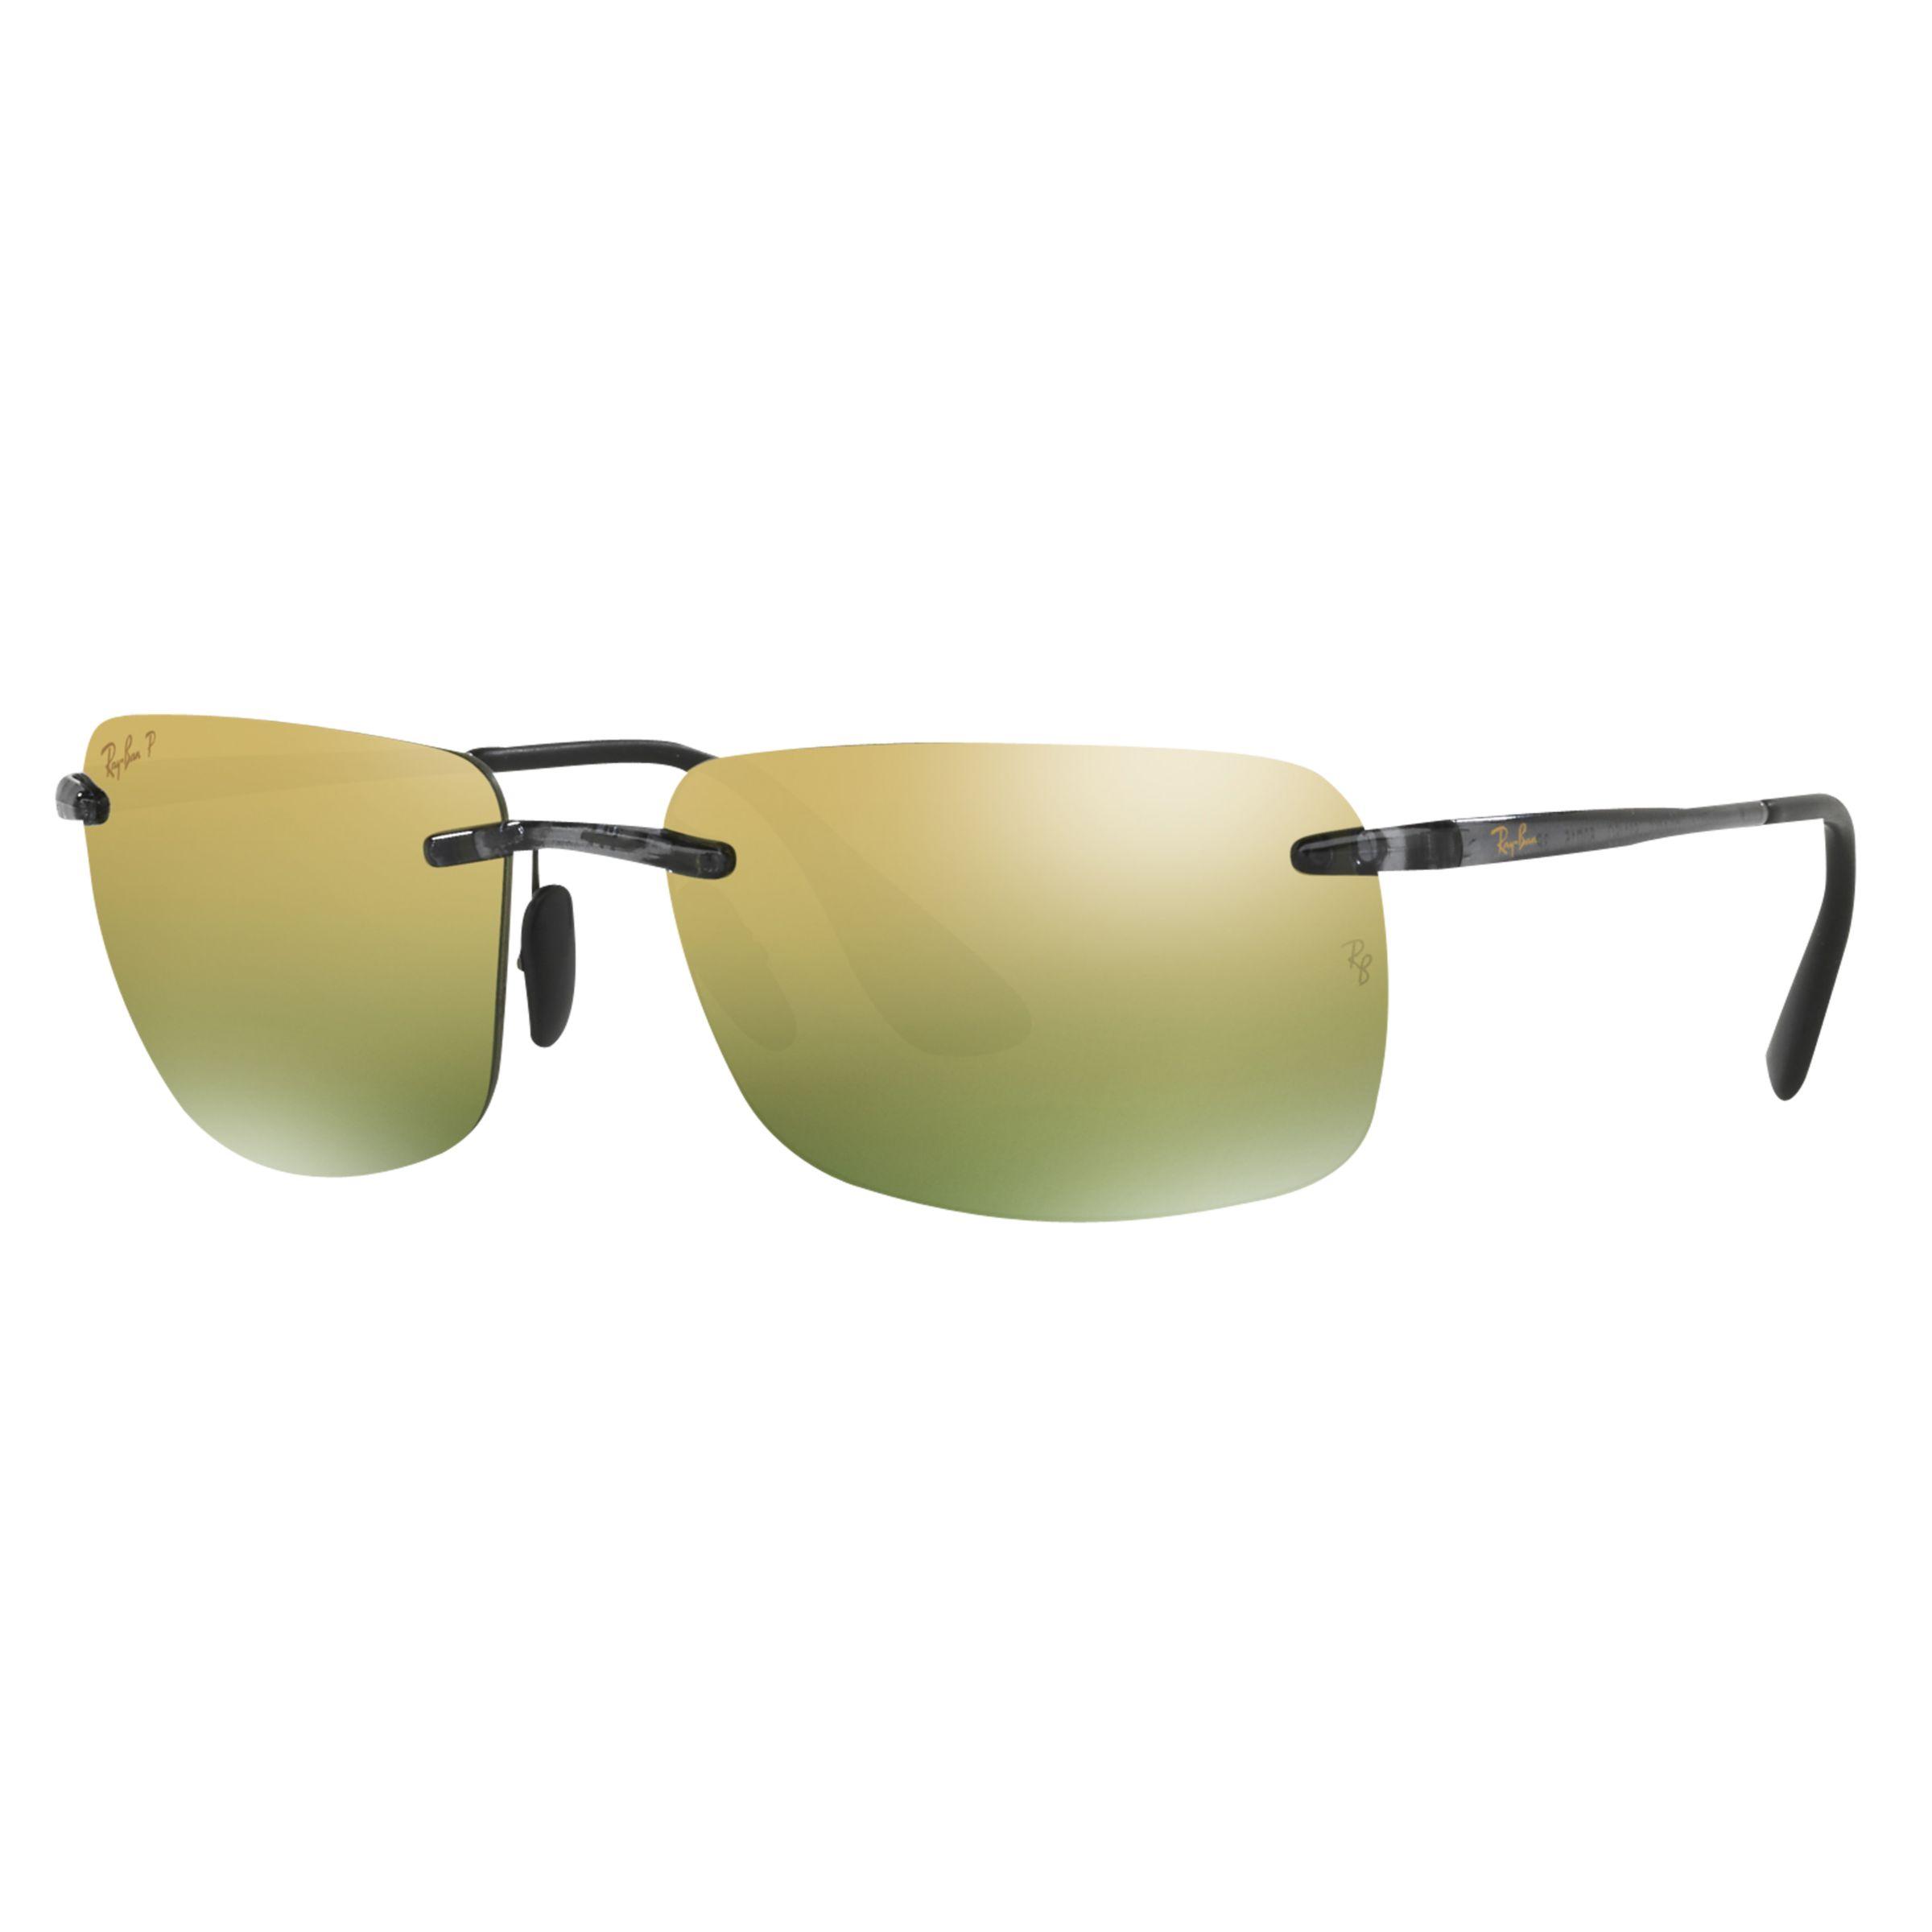 7e0f39629 Ray-Ban RB4255 Polarised Chromance Rectangular Sunglasses at John Lewis &  Partners